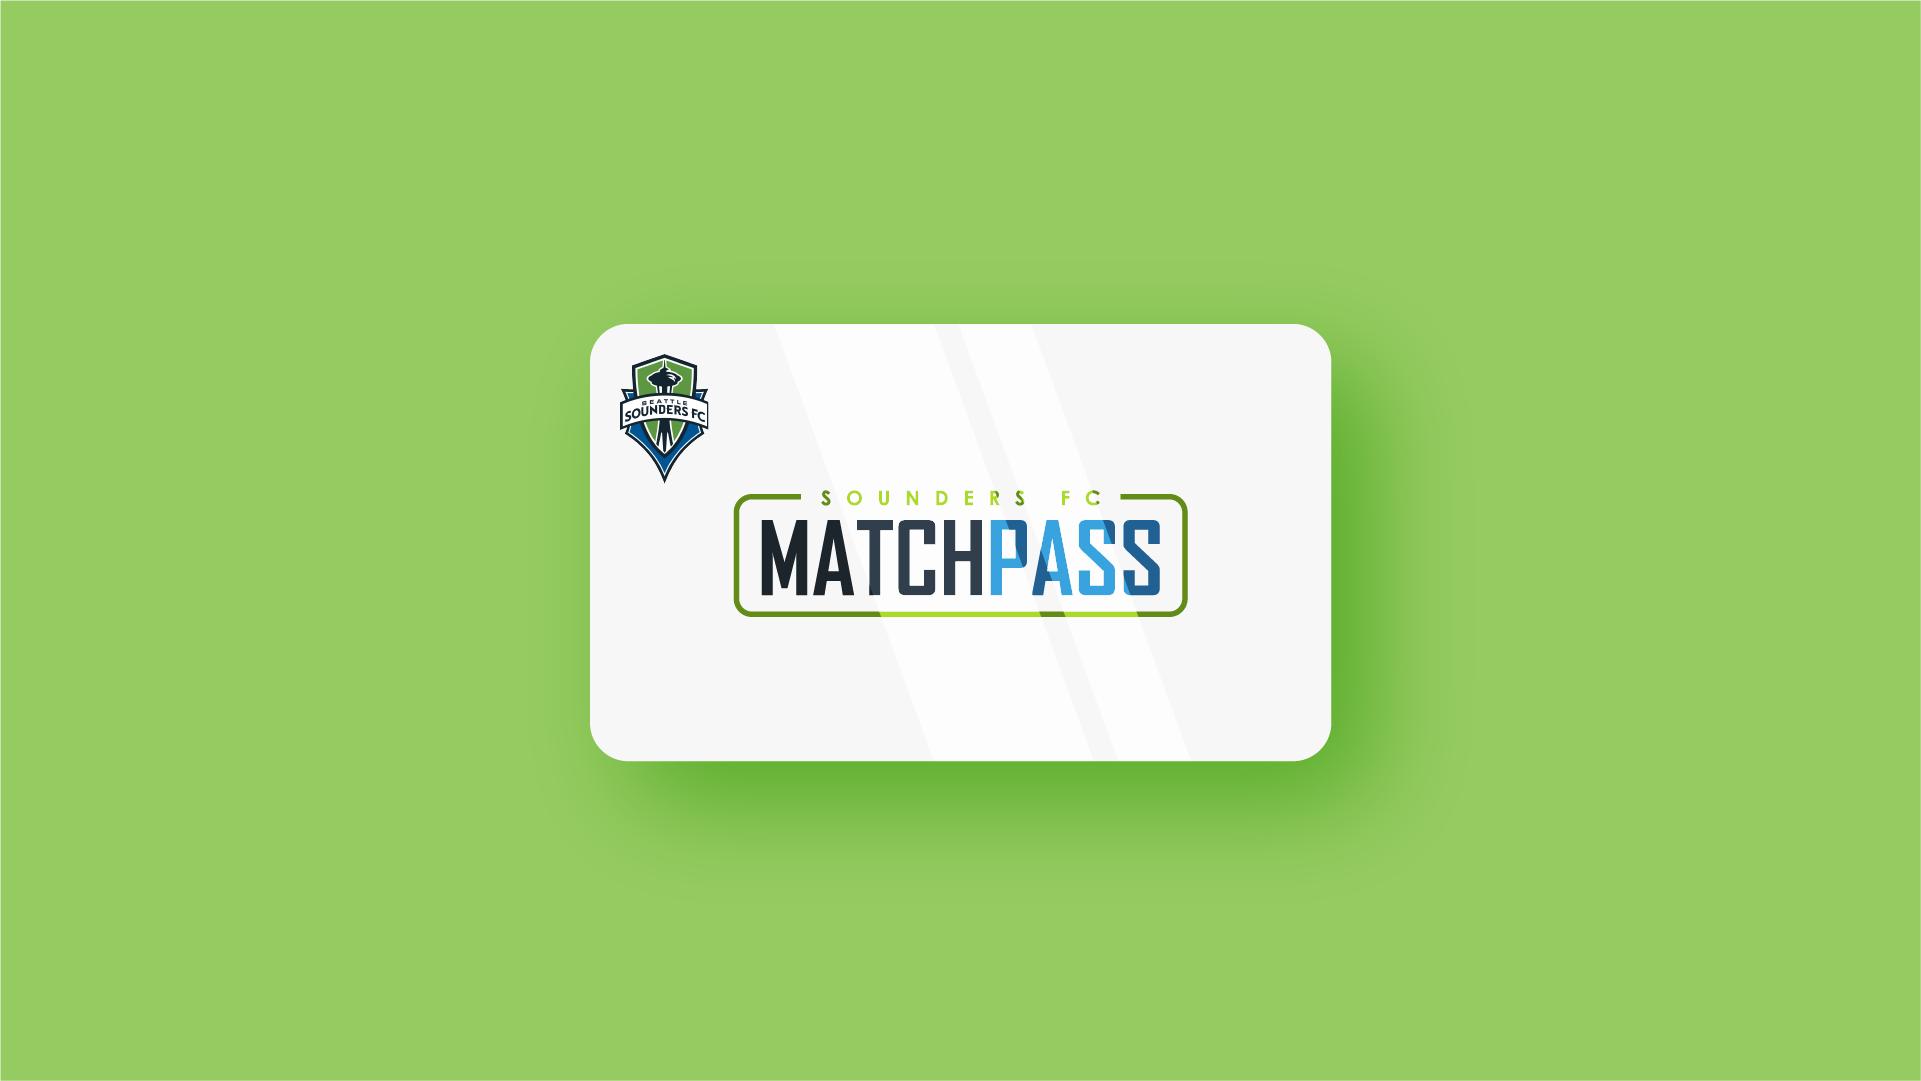 MatchPass_mock ups-04.png